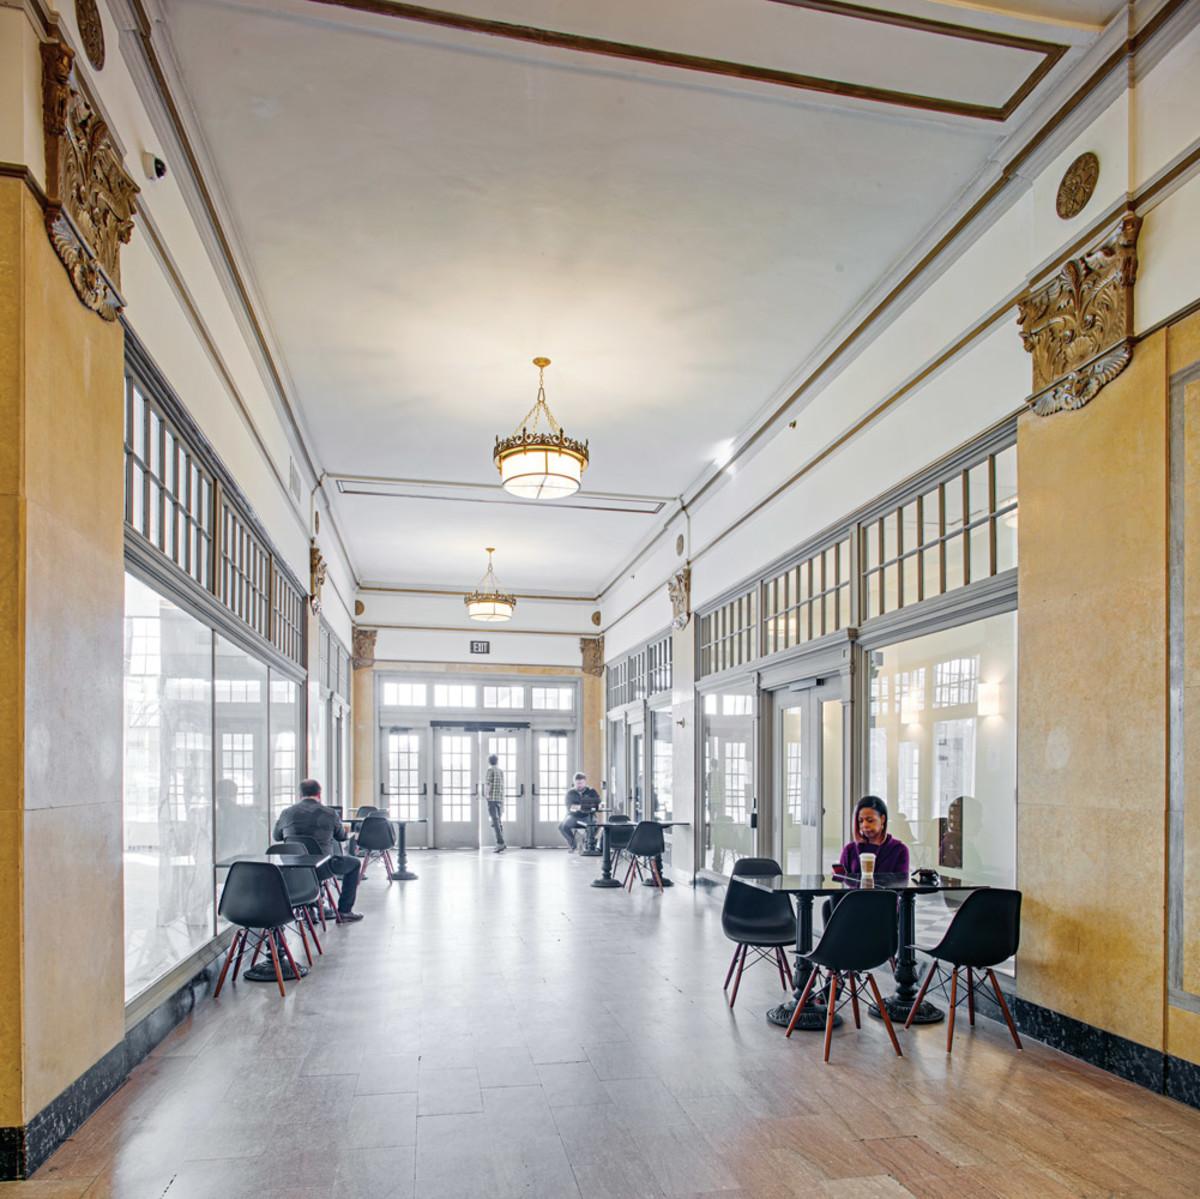 Montgomery Building interior, period hallway